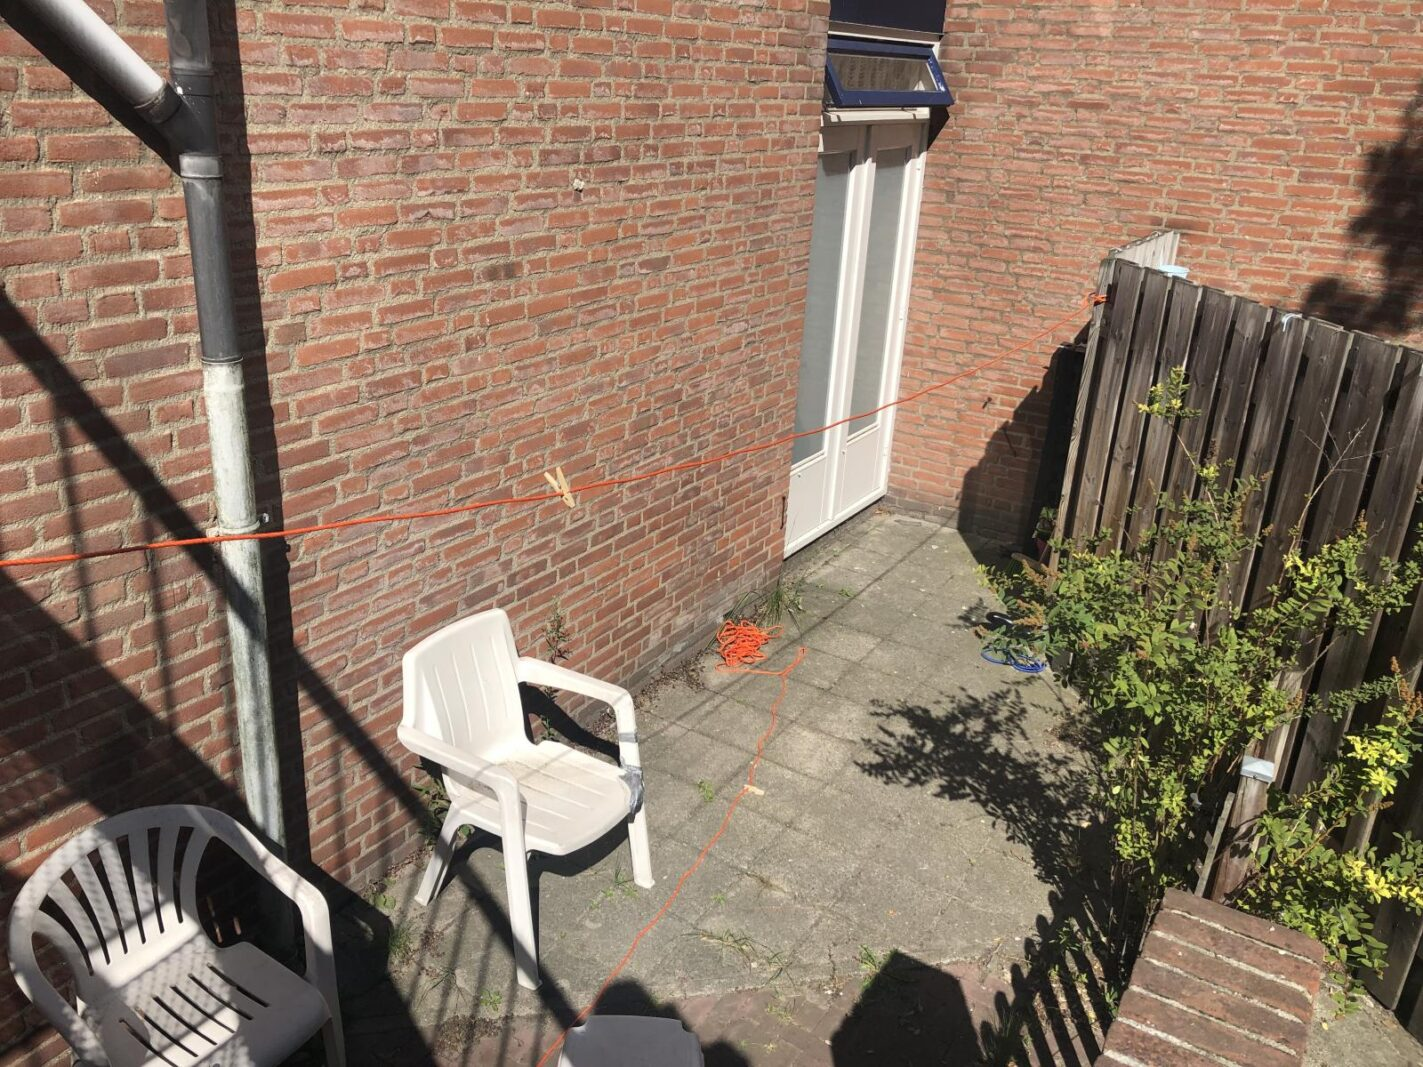 Van Dishoeckstraat 142